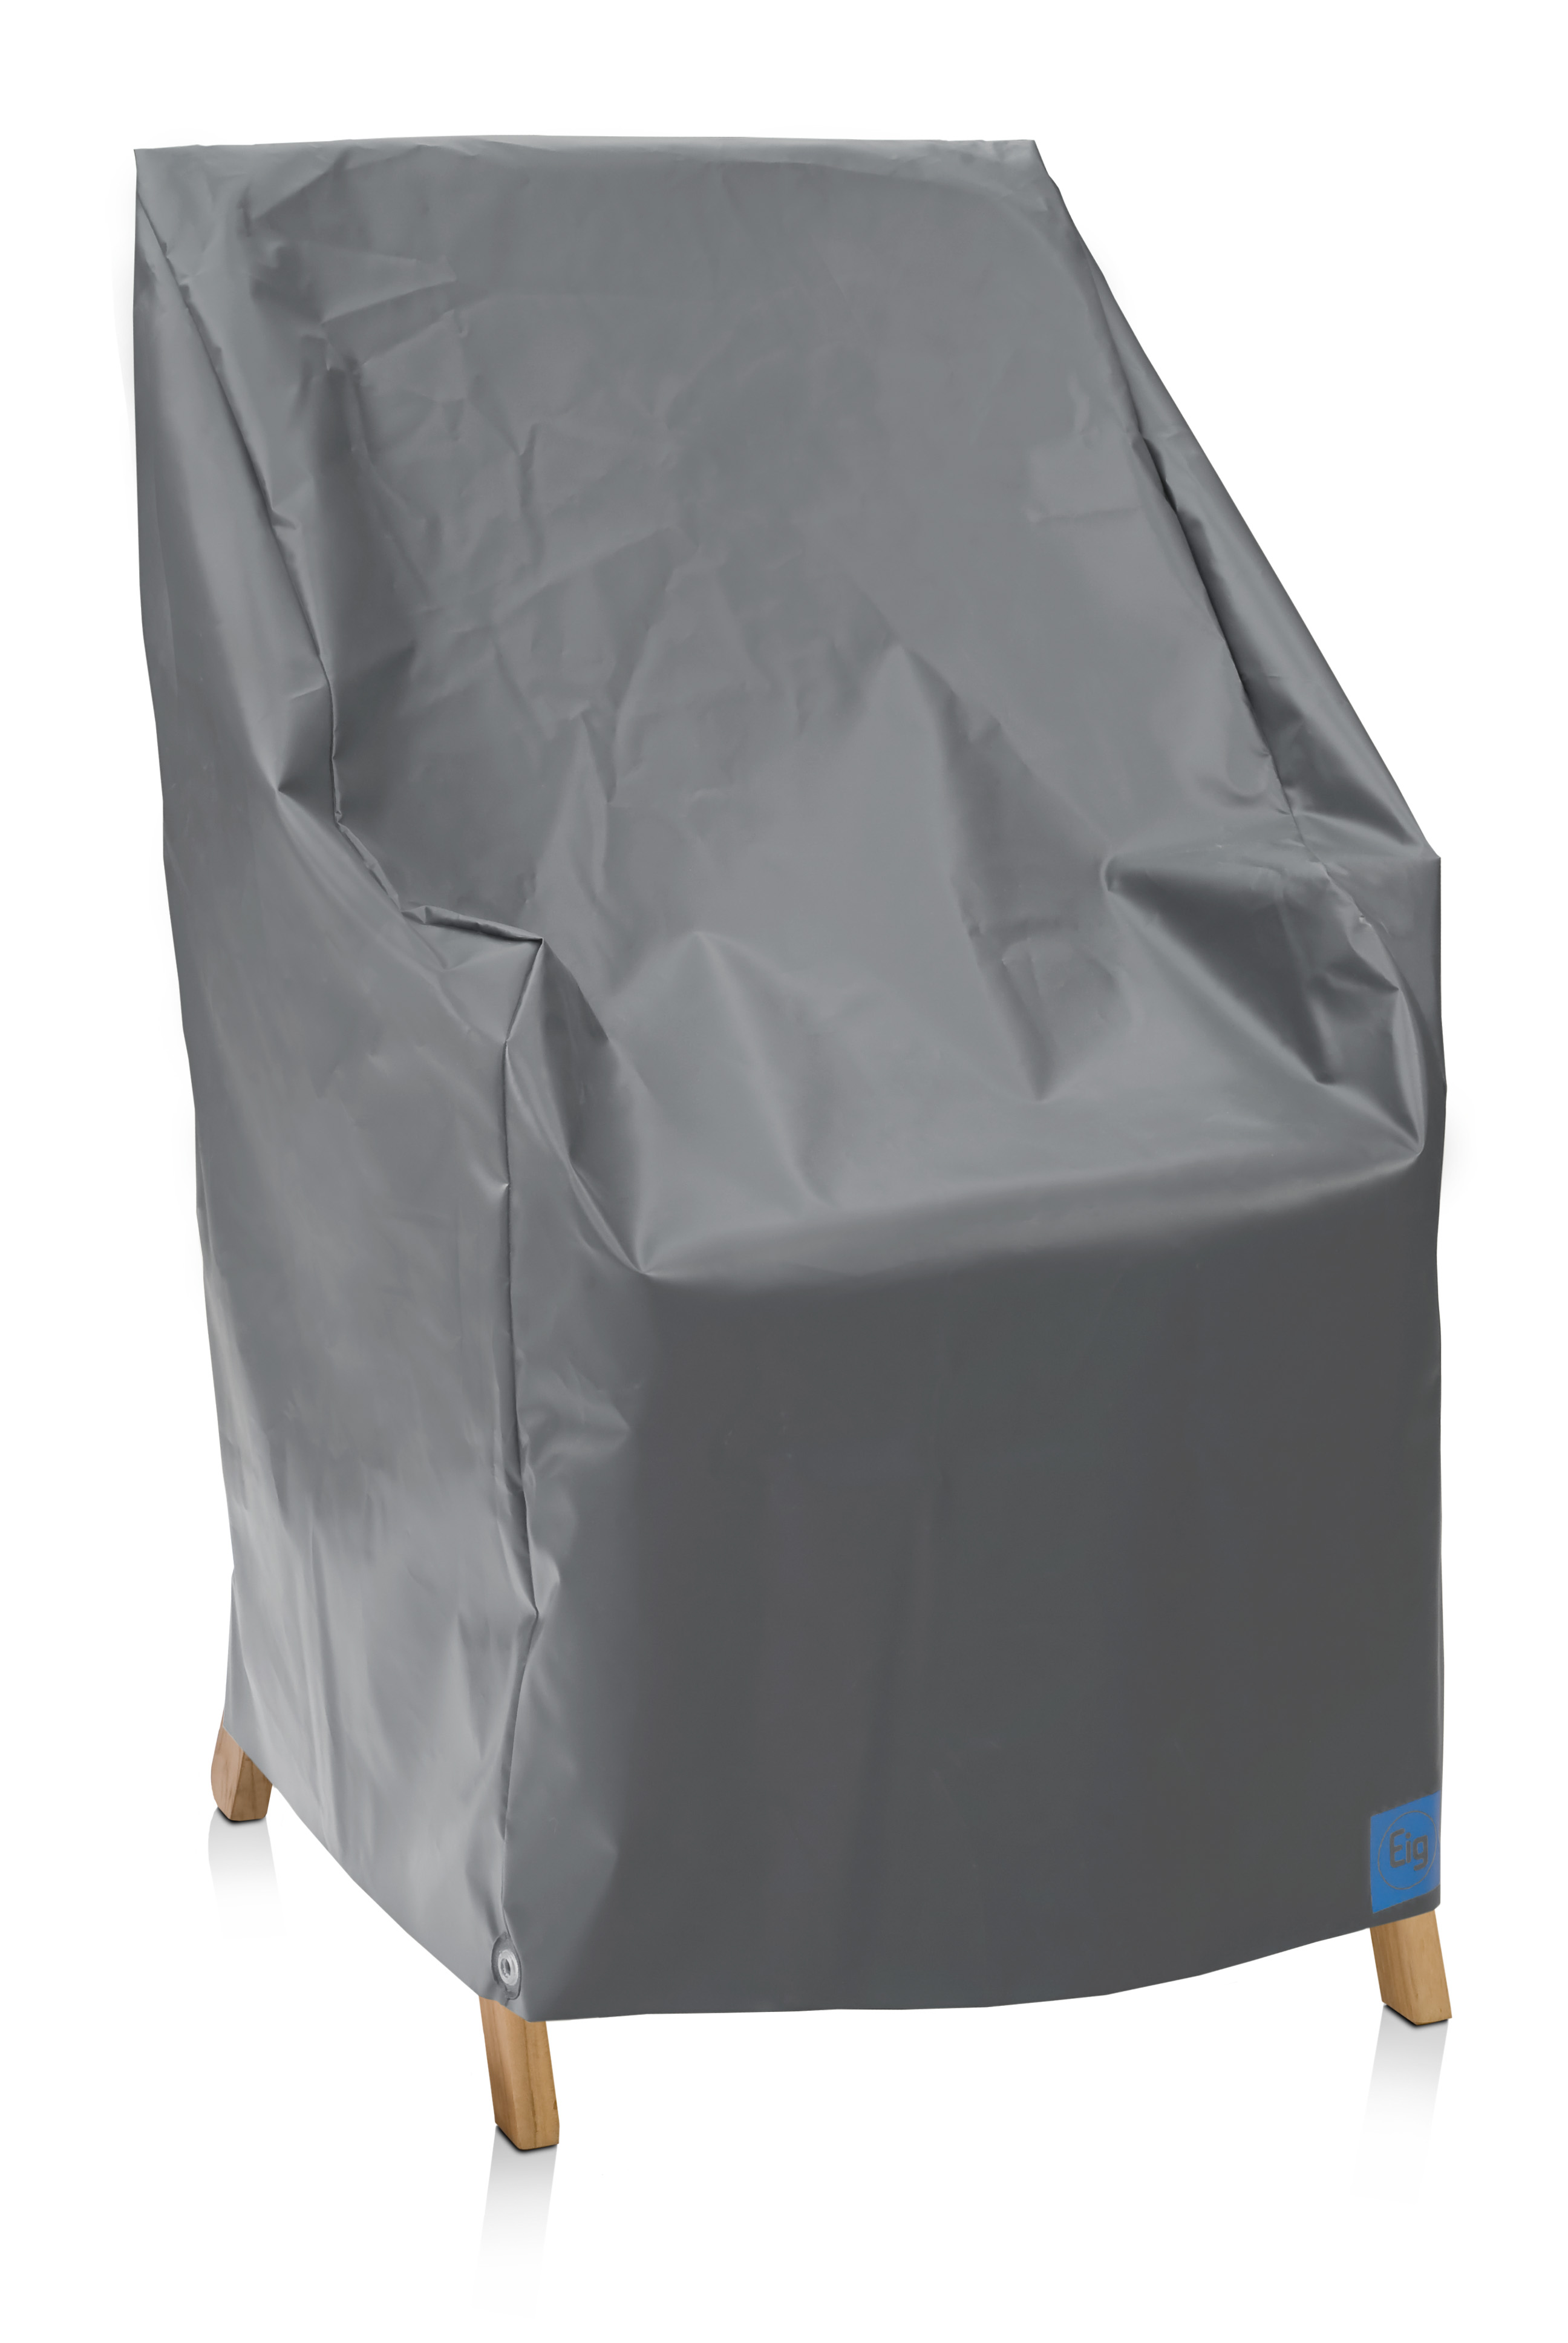 eigbrecht 240101 abdeckhaube schutzh lle f r hochlehner stapelbar 70x80x67 120cm. Black Bedroom Furniture Sets. Home Design Ideas